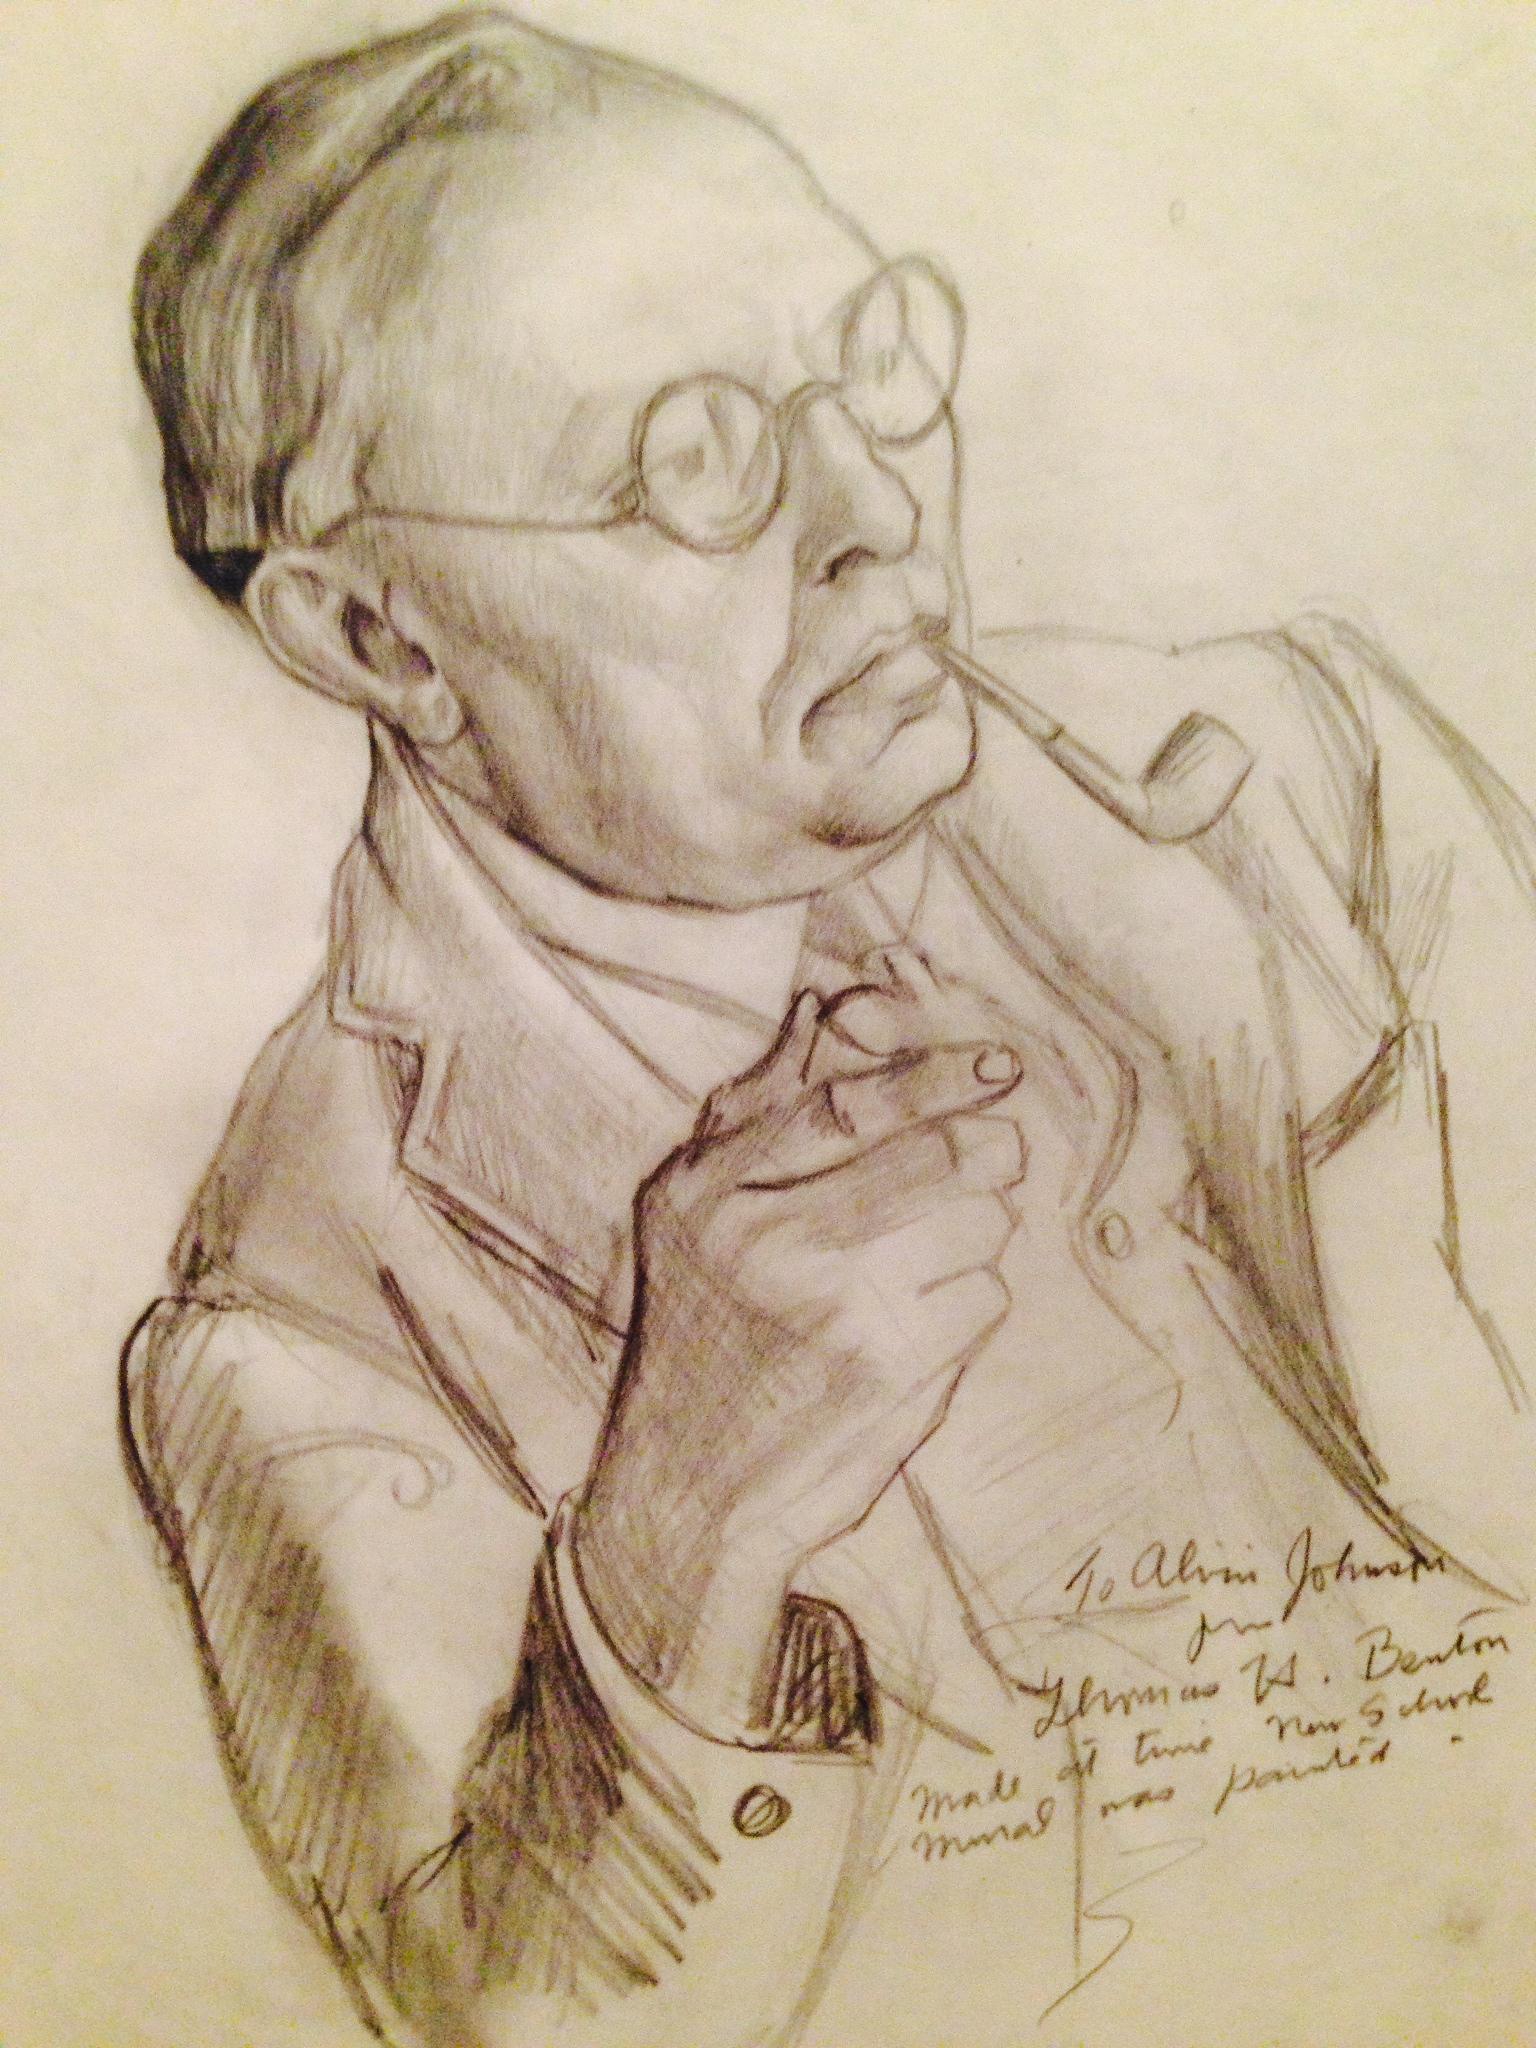 Benton's drawing of Alvin Johnson.